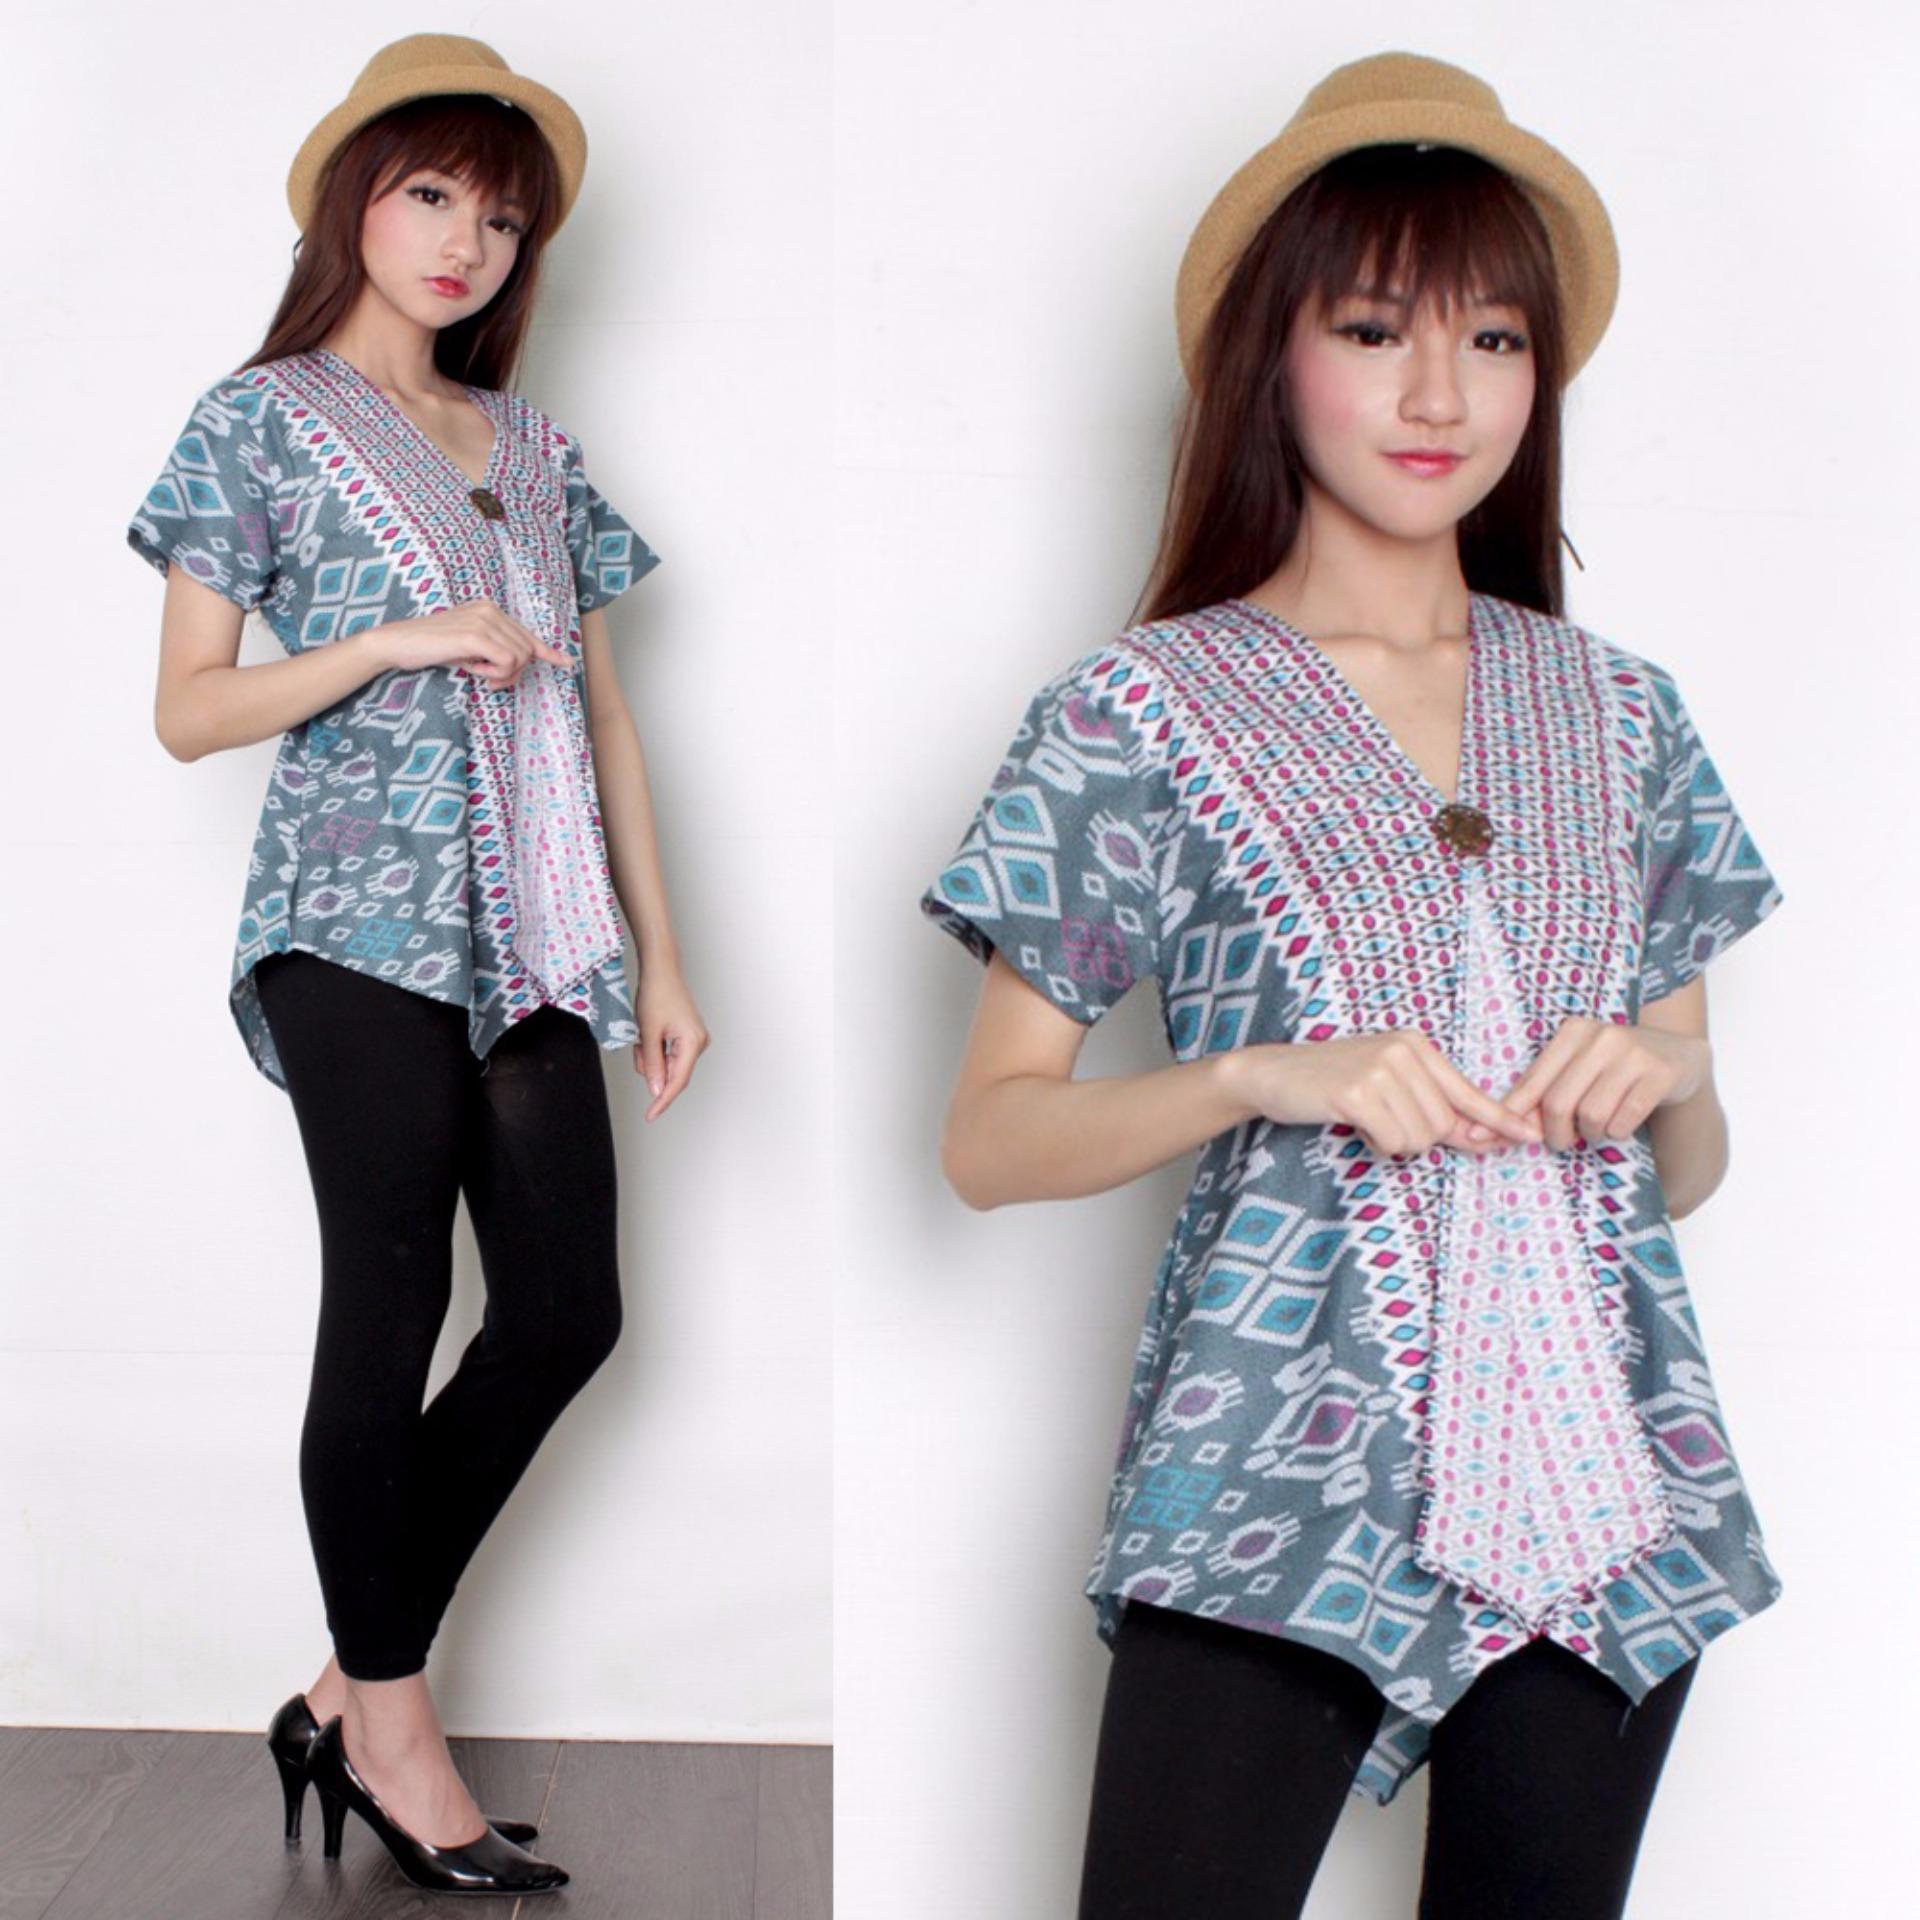 Sb Collection Atasan Blouse Savita Kemeja Jeans Biru Muda Daftar Source · SB Collection Atasan Blouse Callia Kemeja Wanita Biru